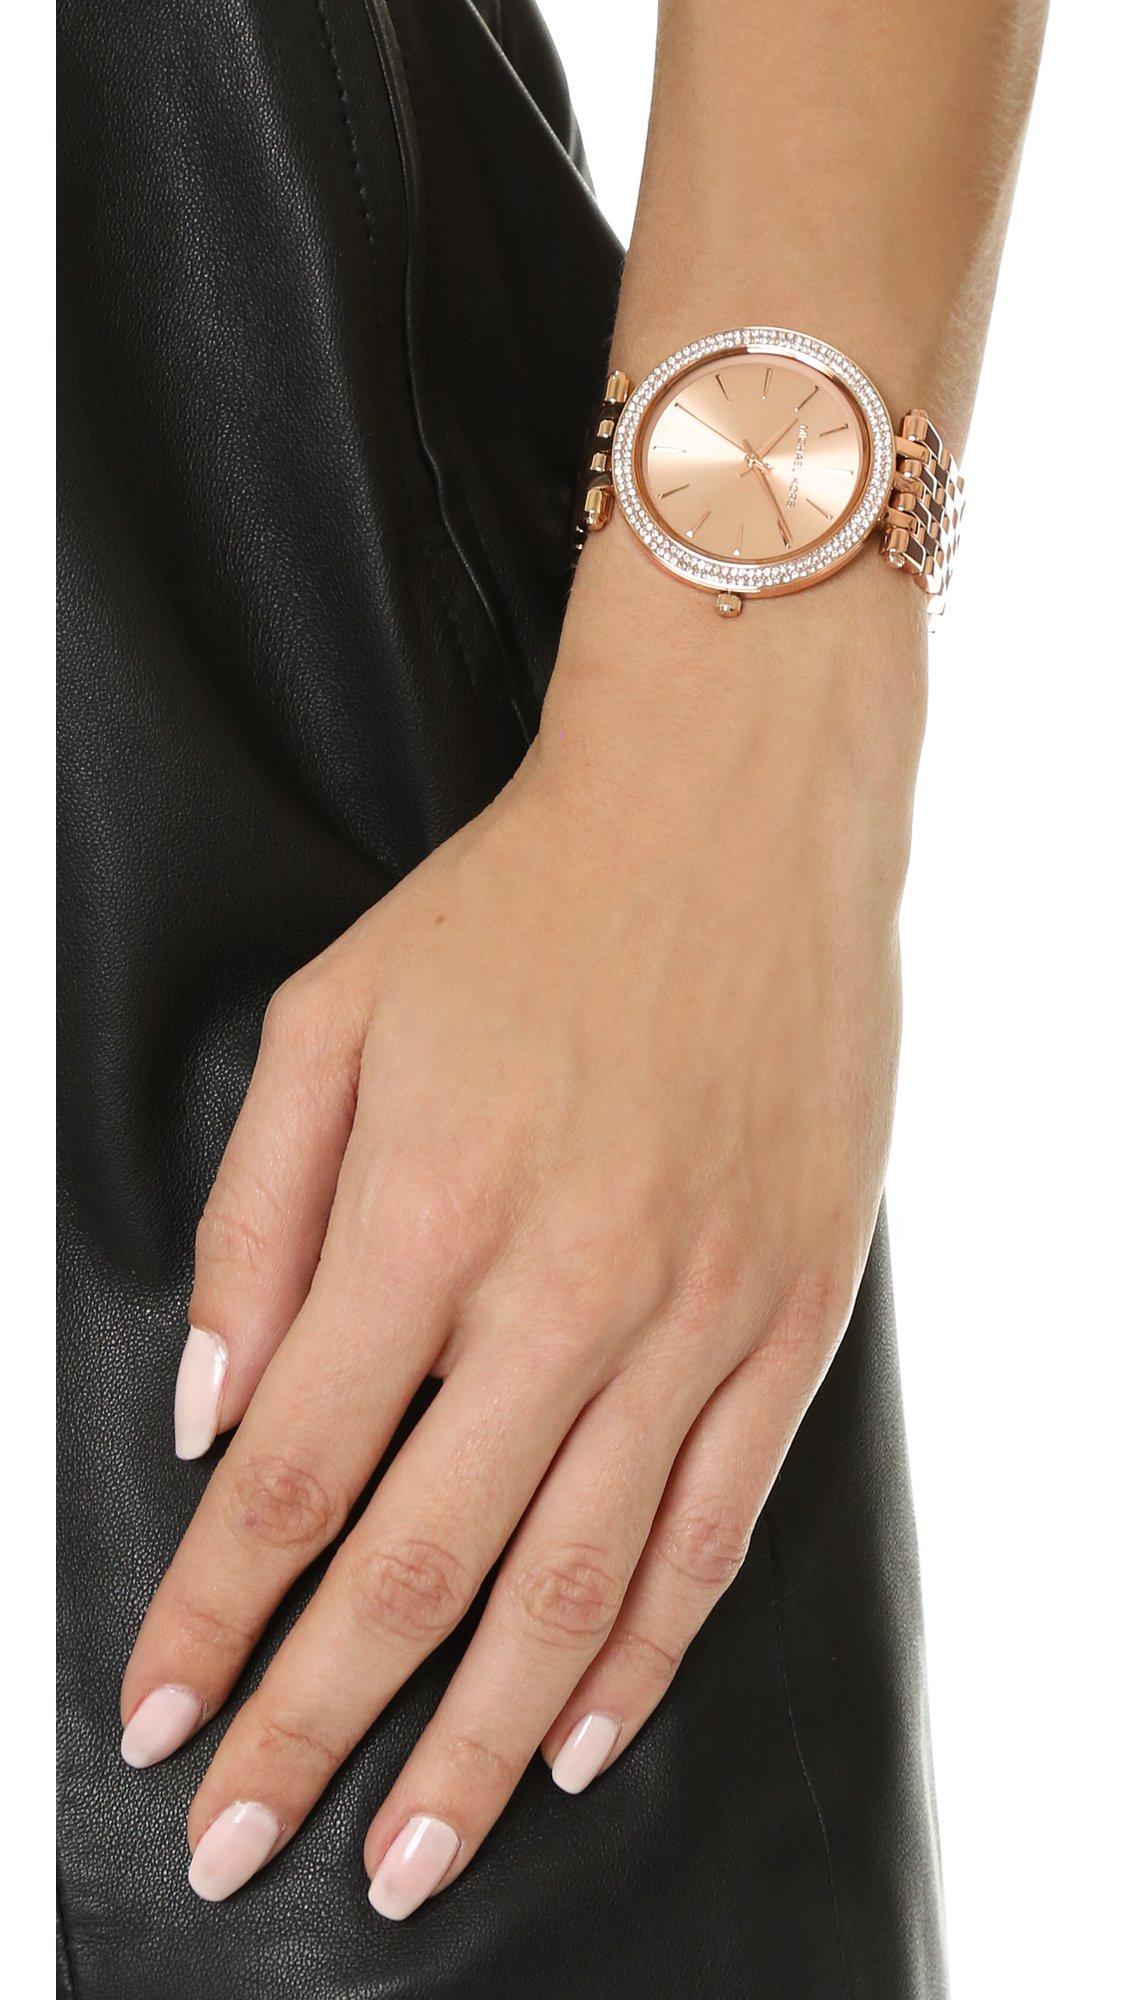 f273058782f6 Lyst - Michael Kors Darci Watch in Pink